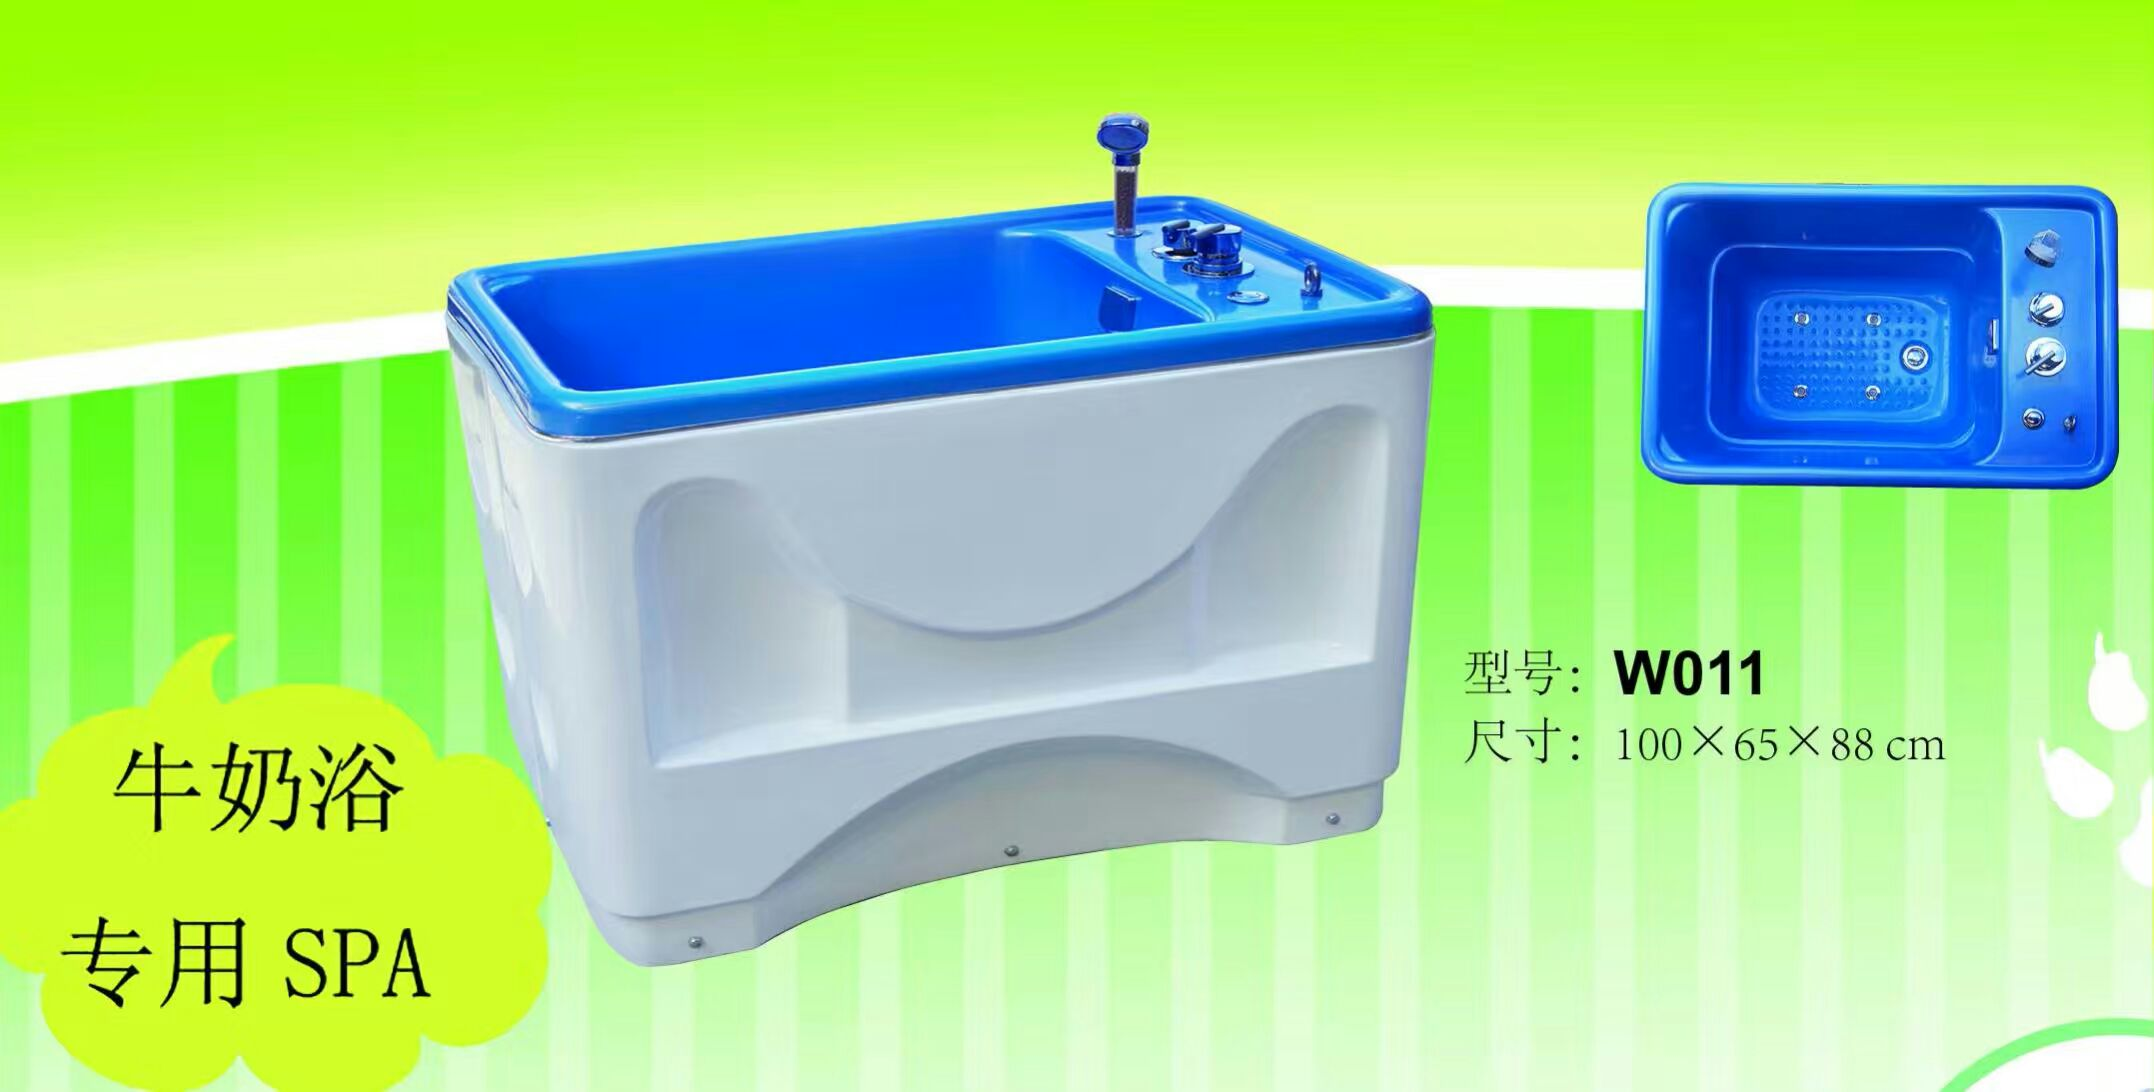 100*65*88cmSPA浴缸带牛奶浴宠物浴缸